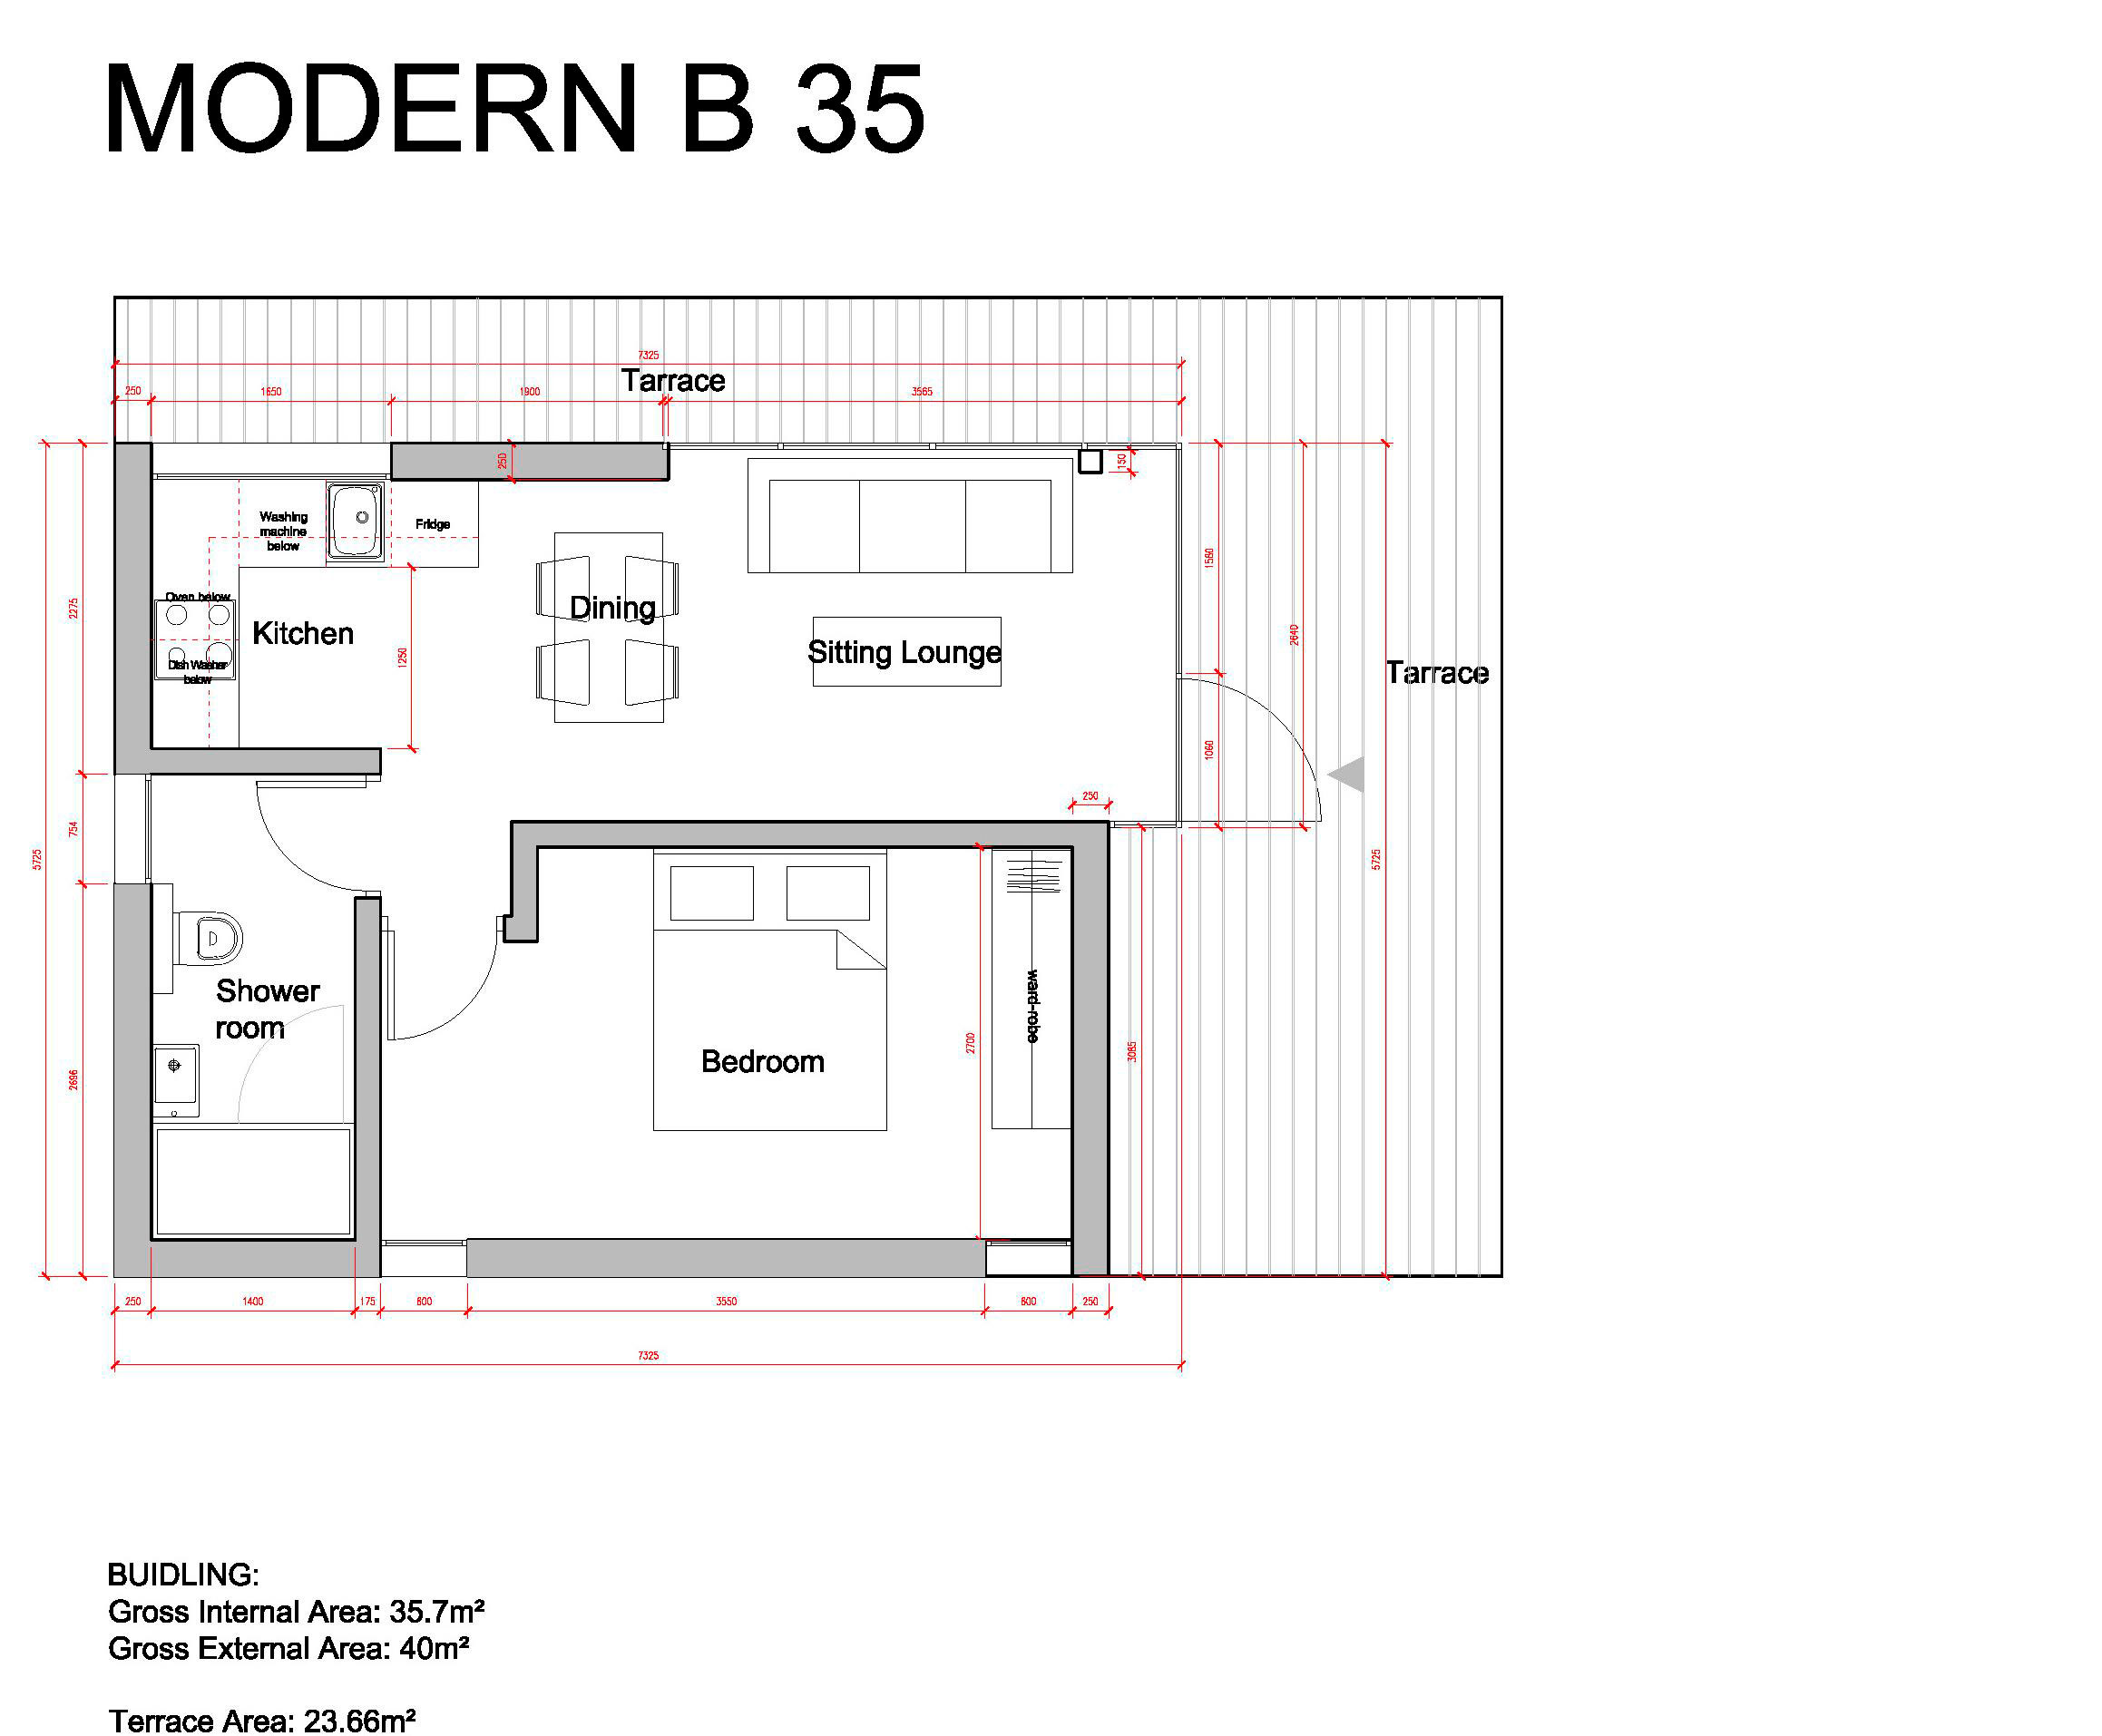 Проект Modern-B 35 - план этажа